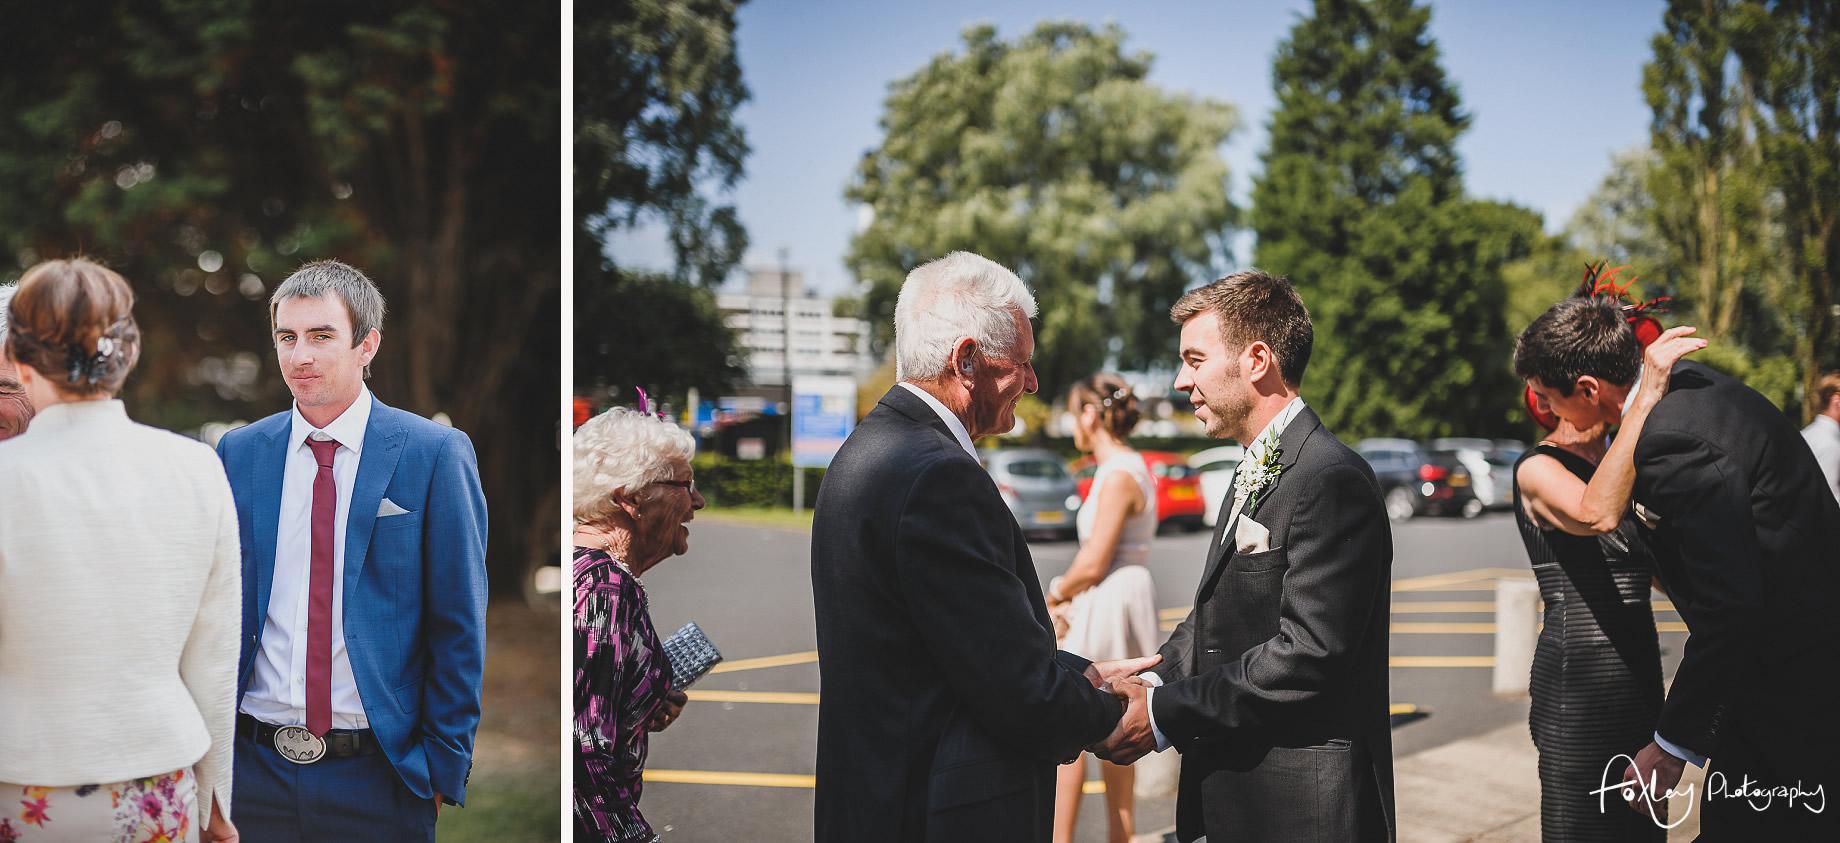 Rebecca and Dan Wedding at Preston Marriott Hotel 021